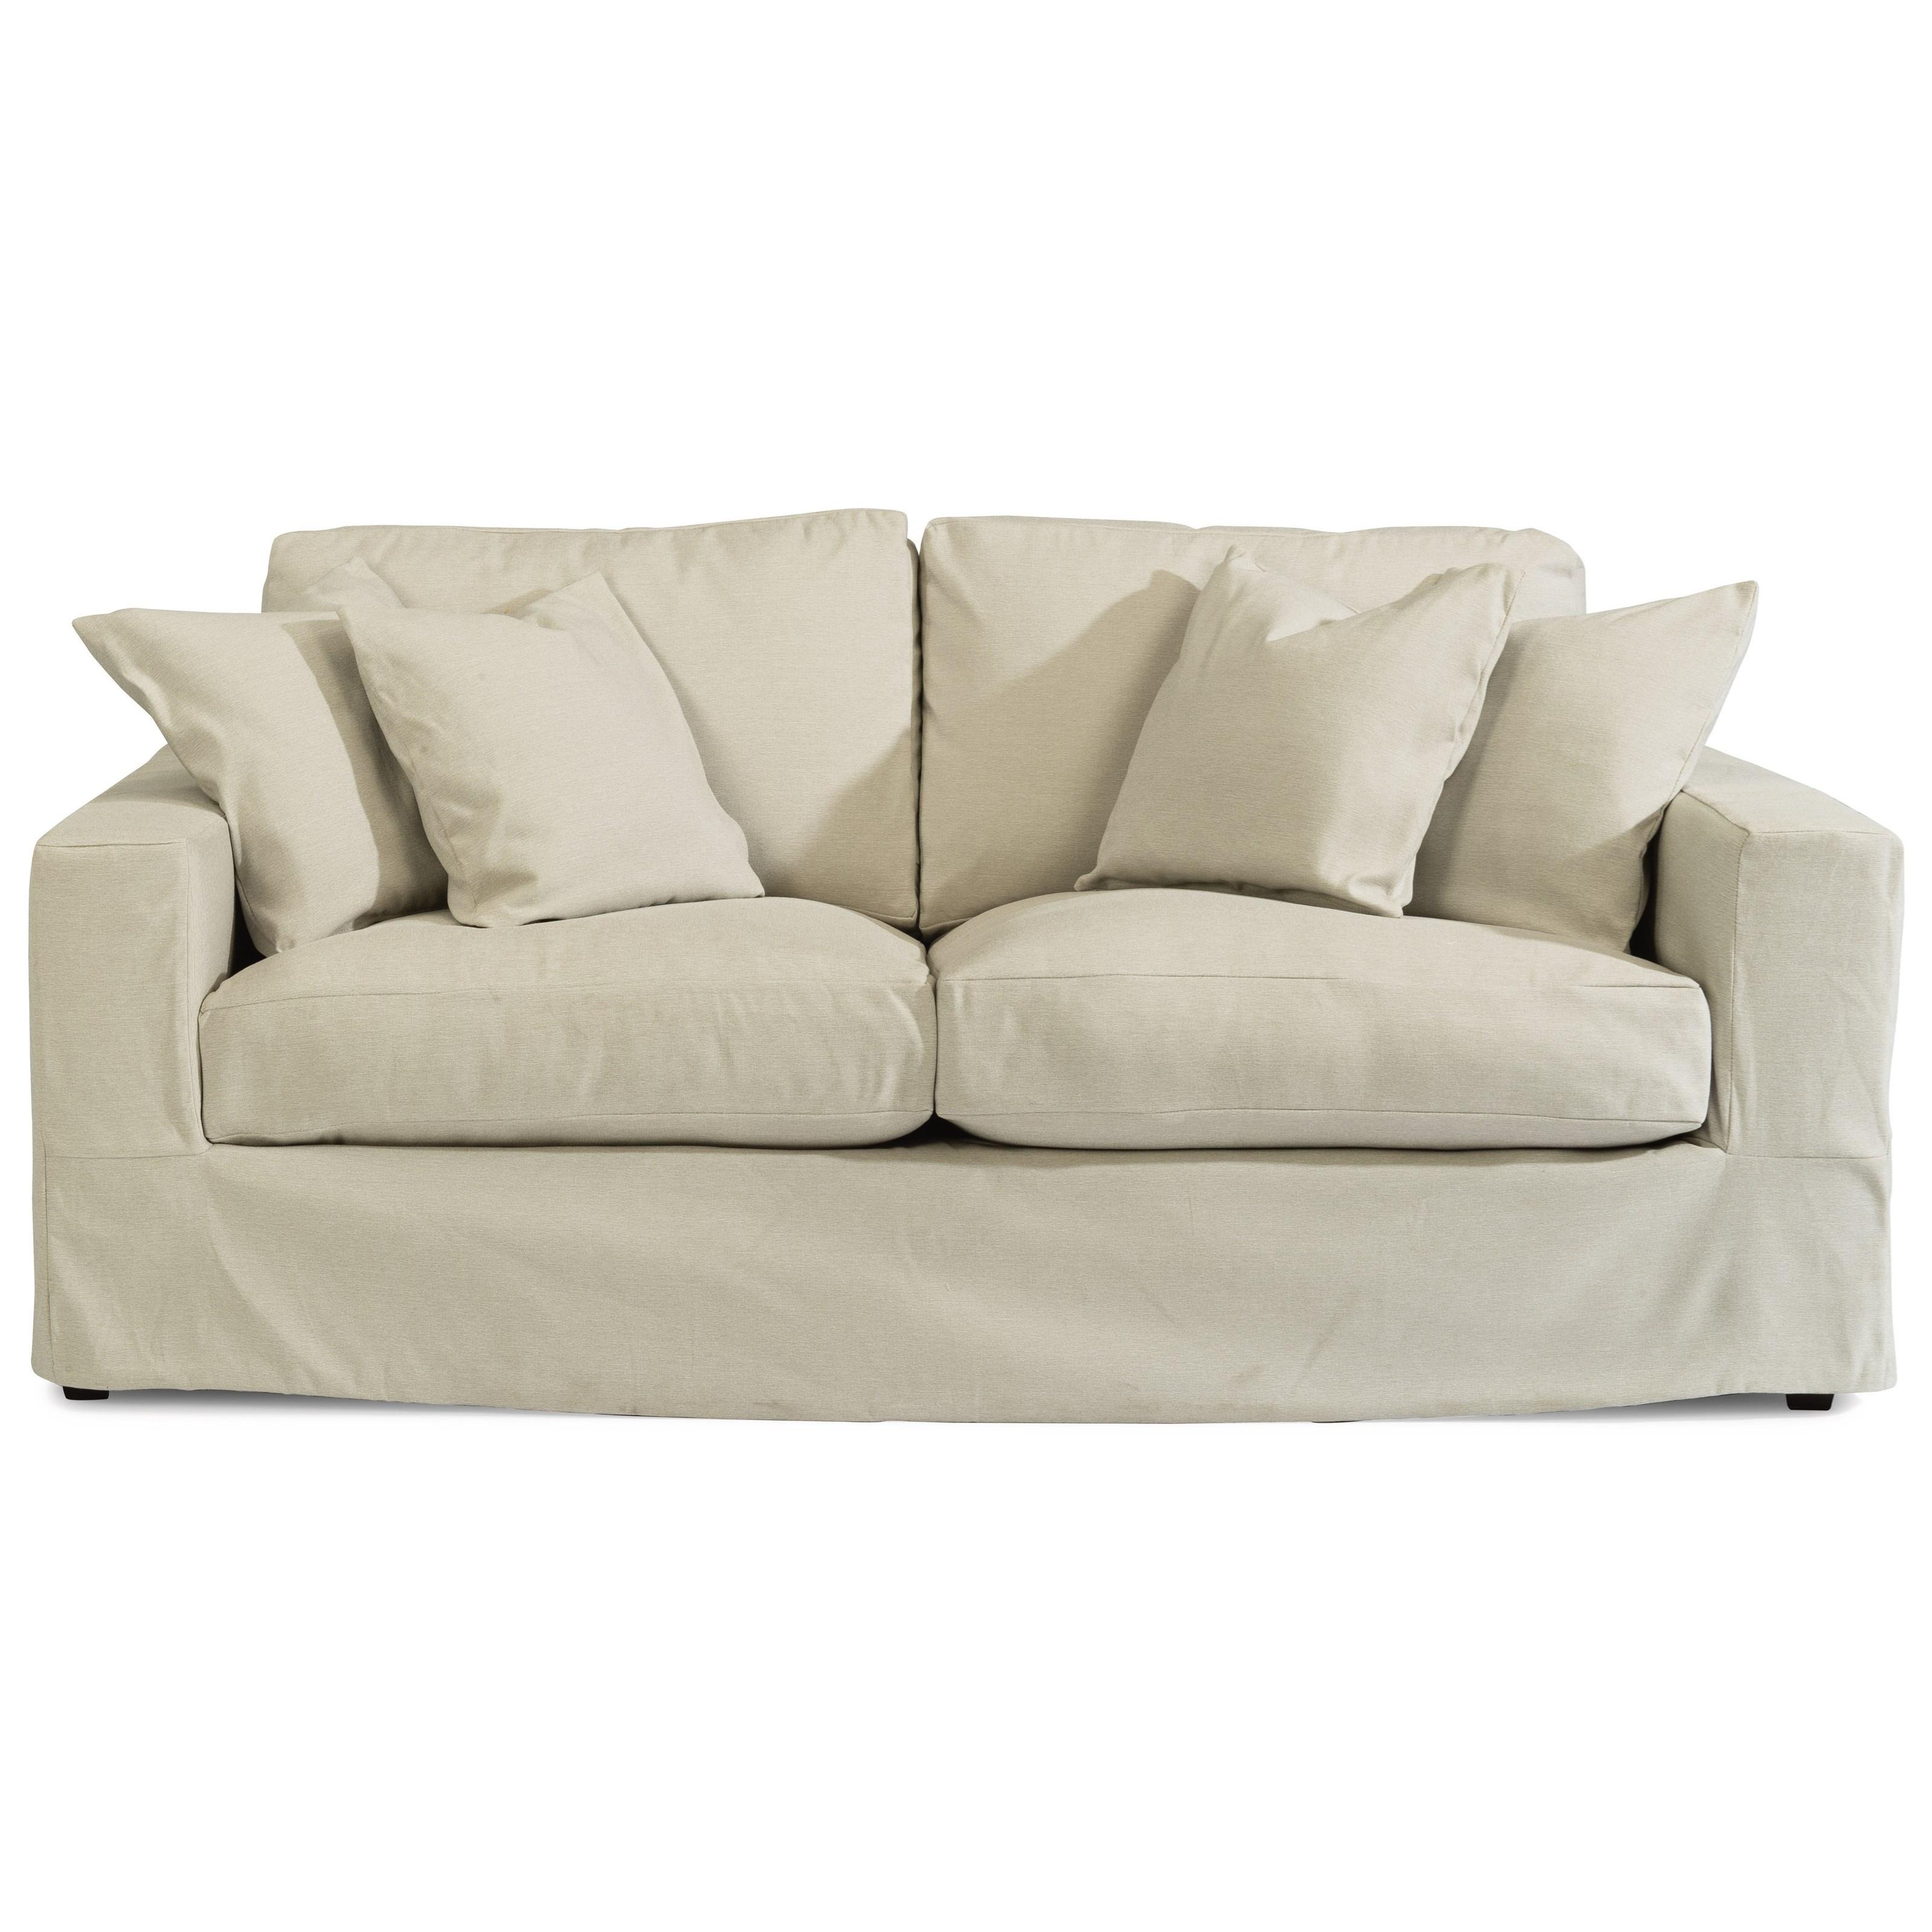 Slipcovered 2-Cushion Sofa